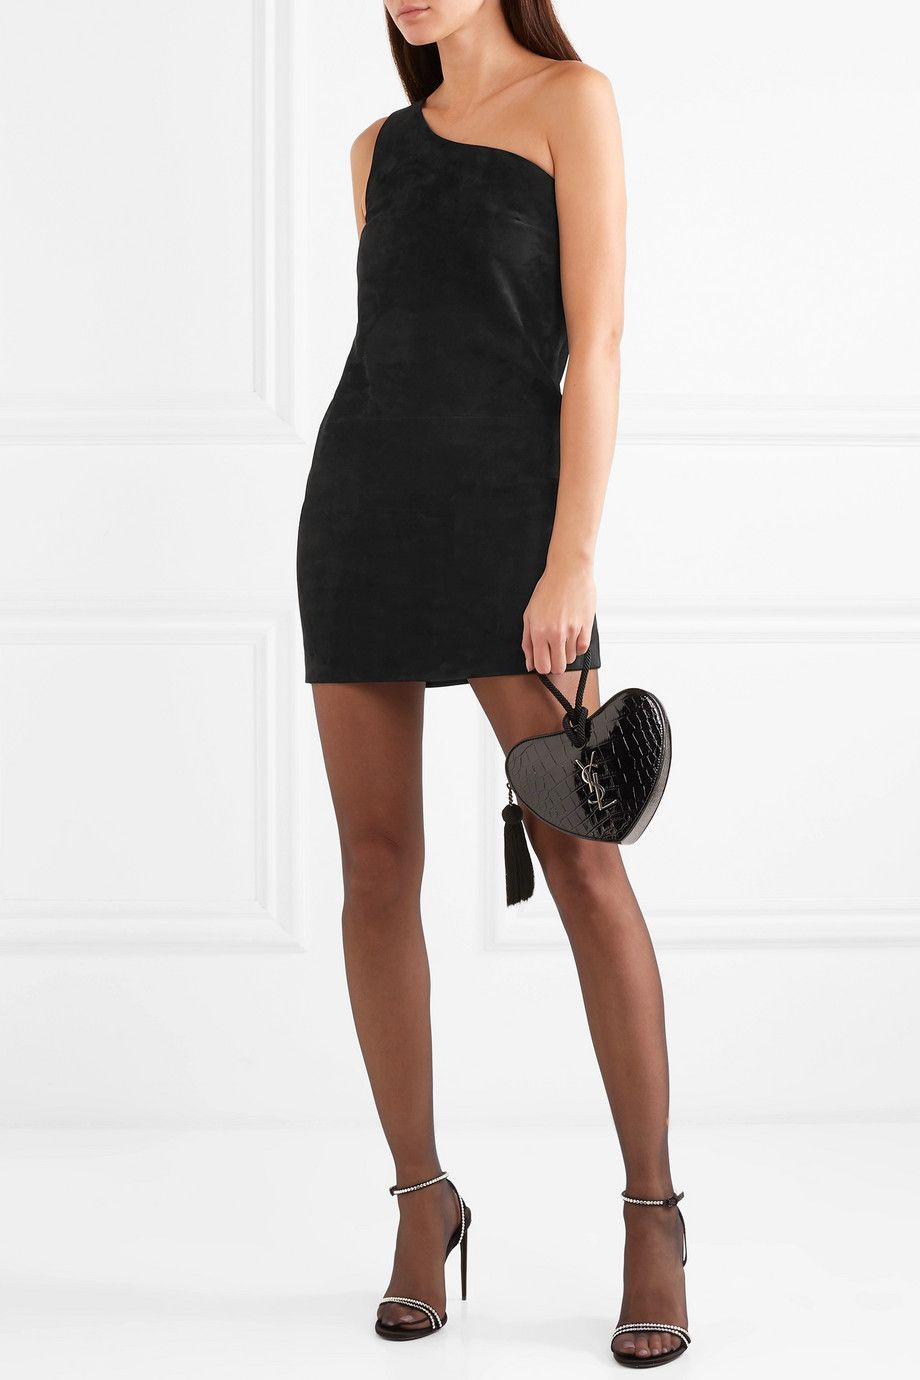 11609c3f53b Saint Laurent   One-shoulder suede mini dress   NET-A-PORTER.COM ...